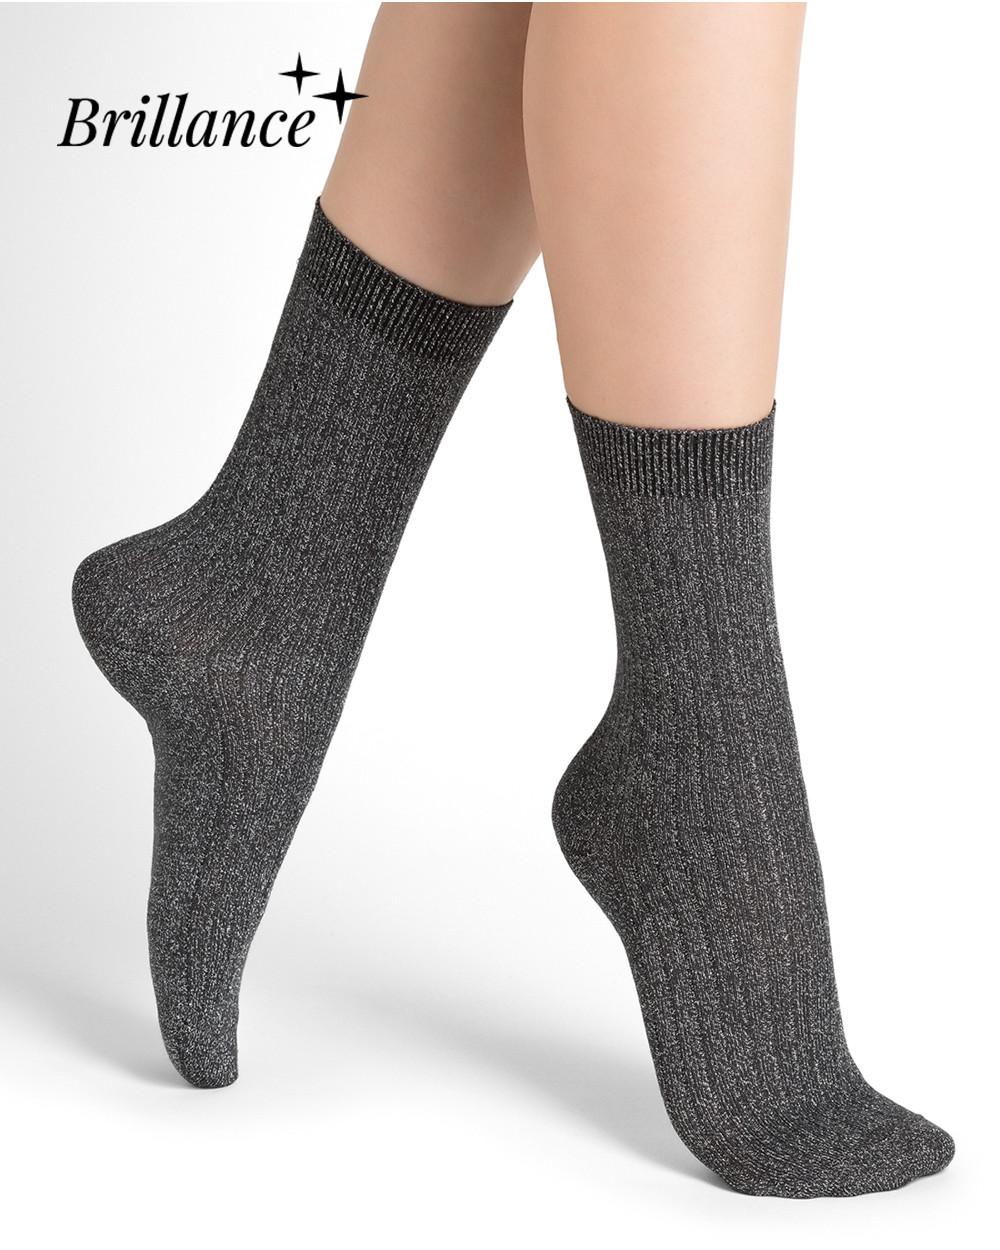 Glossy ribbed cotton socks